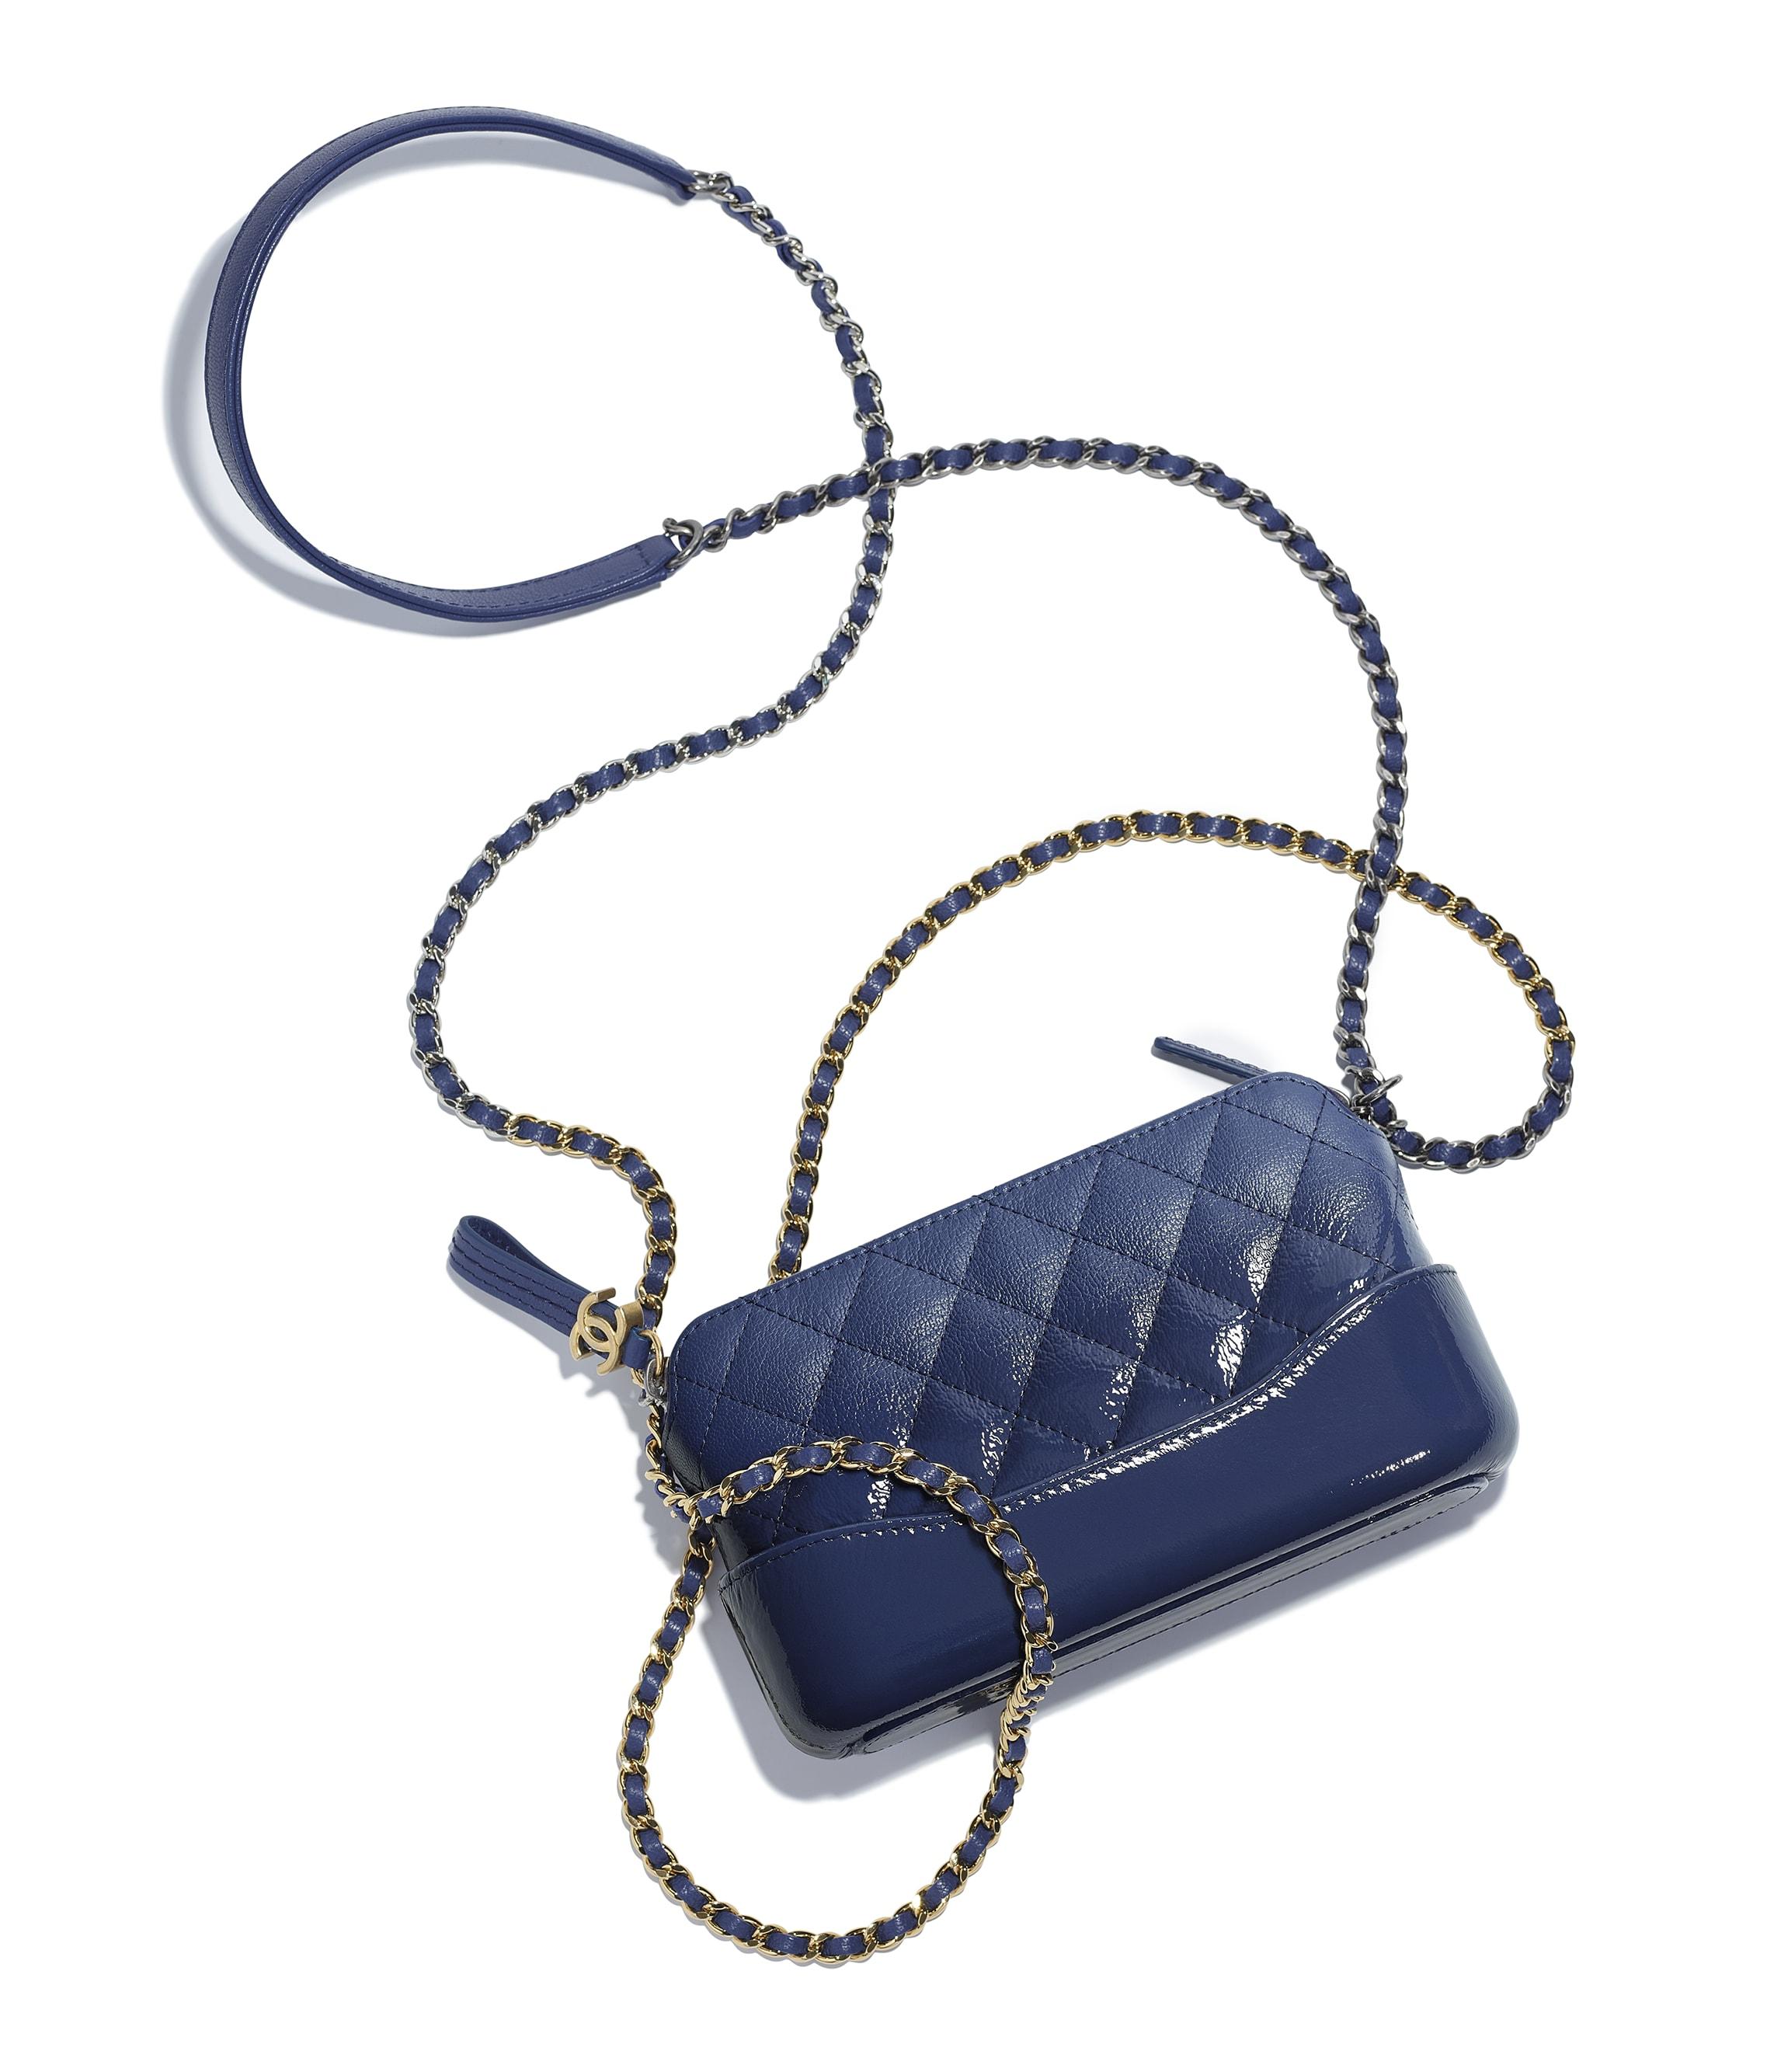 pochette mit kette ziegenleder ziegenlackleder silber goldfarbenes metall dunkelblau chanel. Black Bedroom Furniture Sets. Home Design Ideas